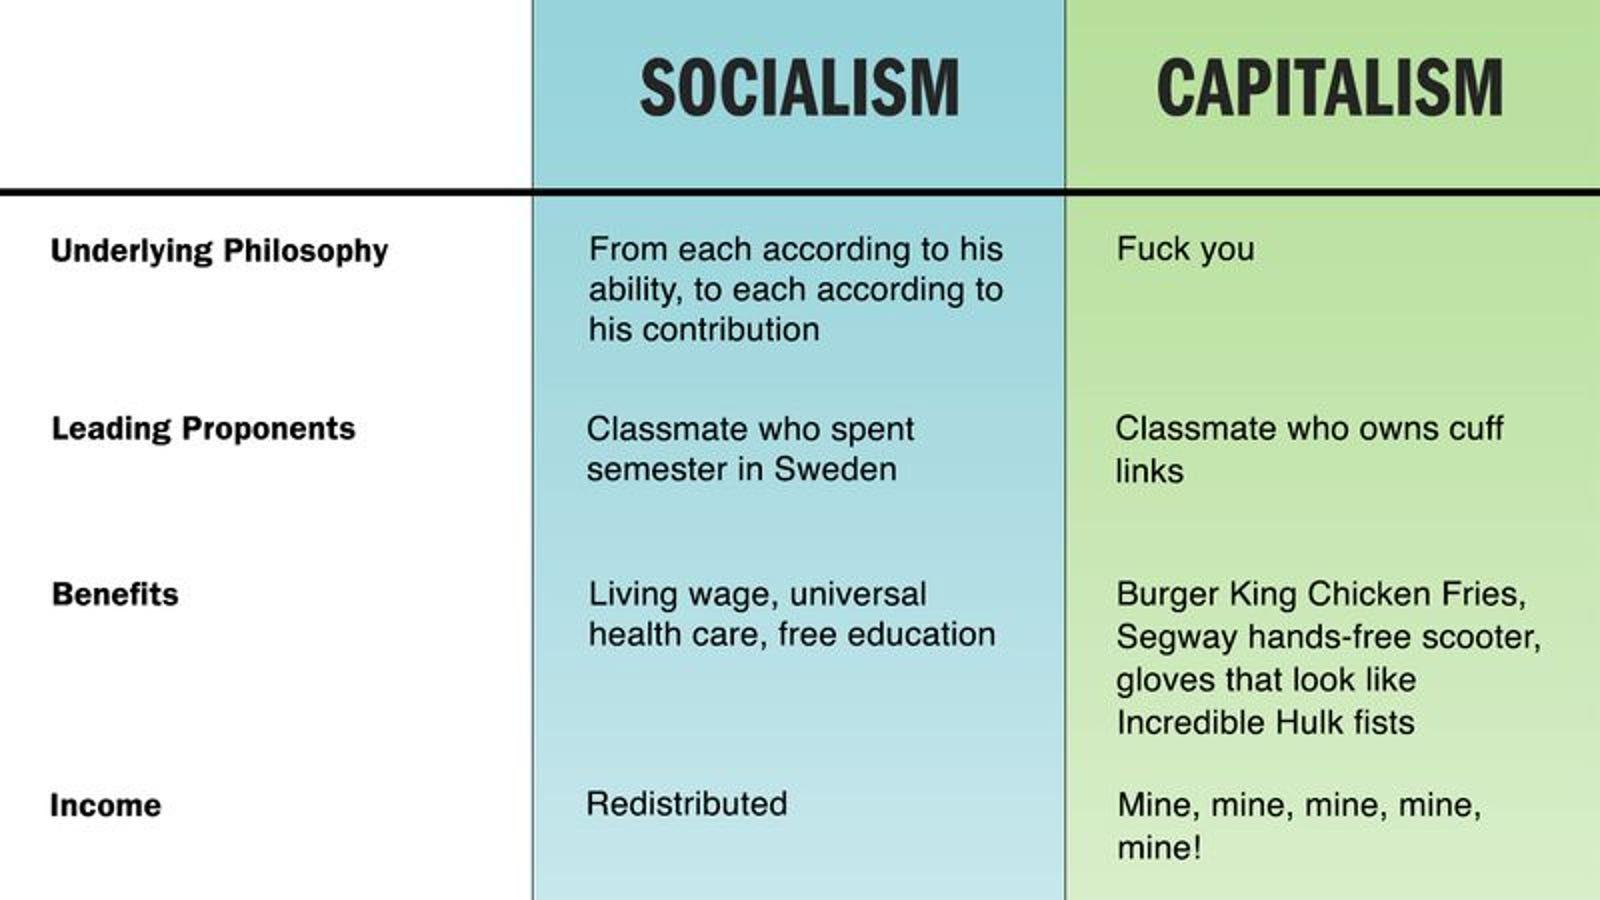 essays on socialism vs capitalism Capitalism vs socialism essays: over 180,000 capitalism vs socialism essays, capitalism vs socialism term papers, capitalism vs socialism research paper, book reports 184 990 essays, term and research papers available for unlimited access.